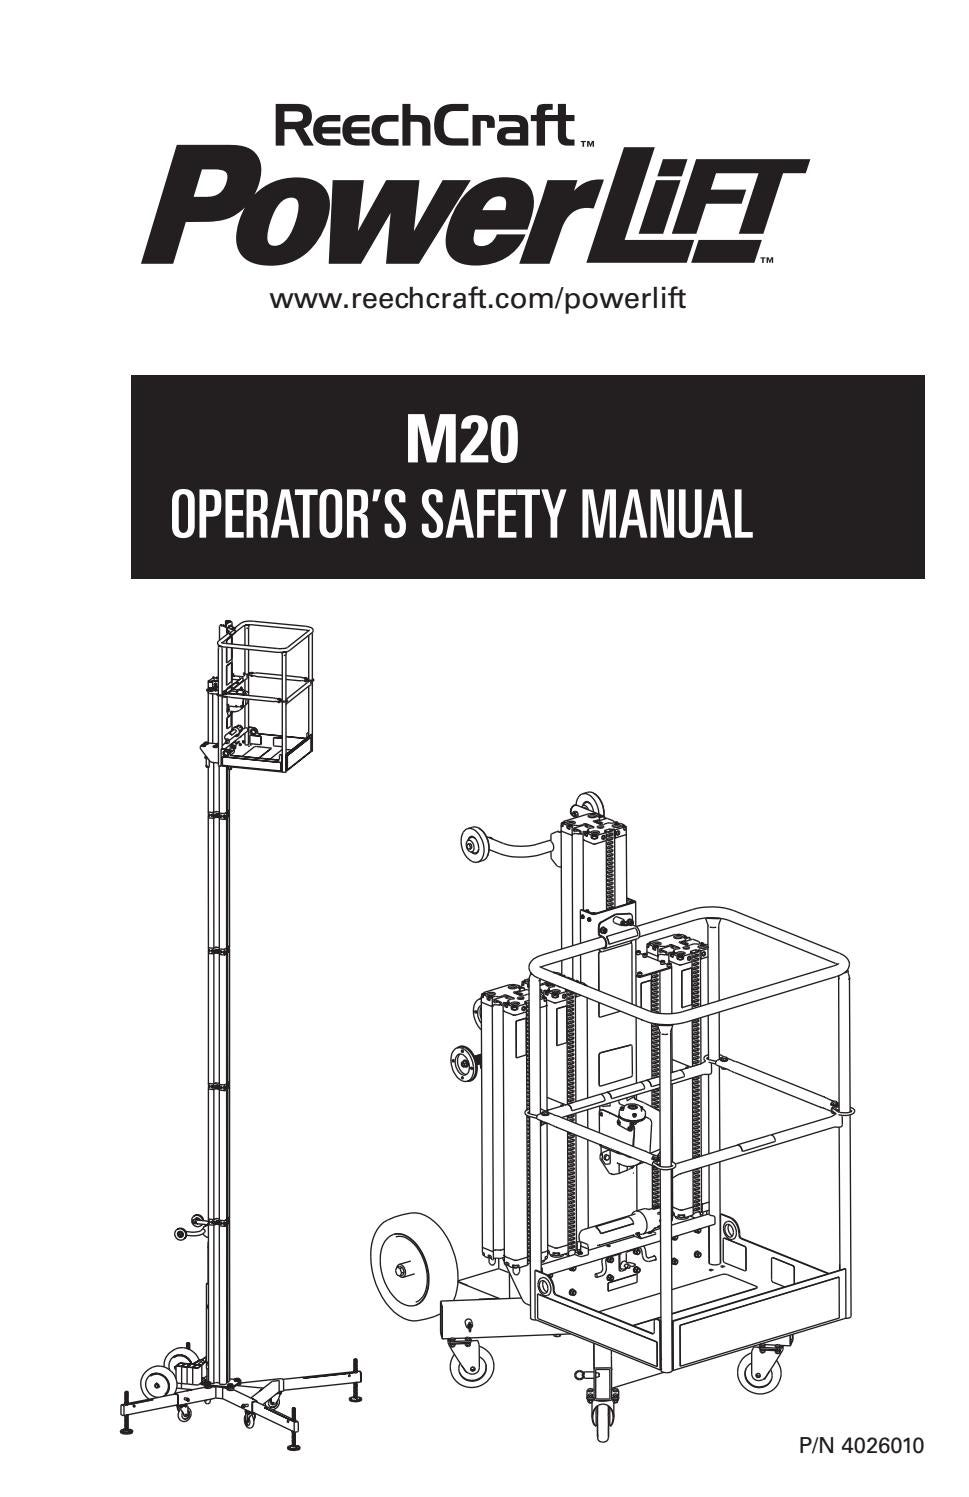 PowerLift M20 Operator's Manual 2015 by ReechCraft Access